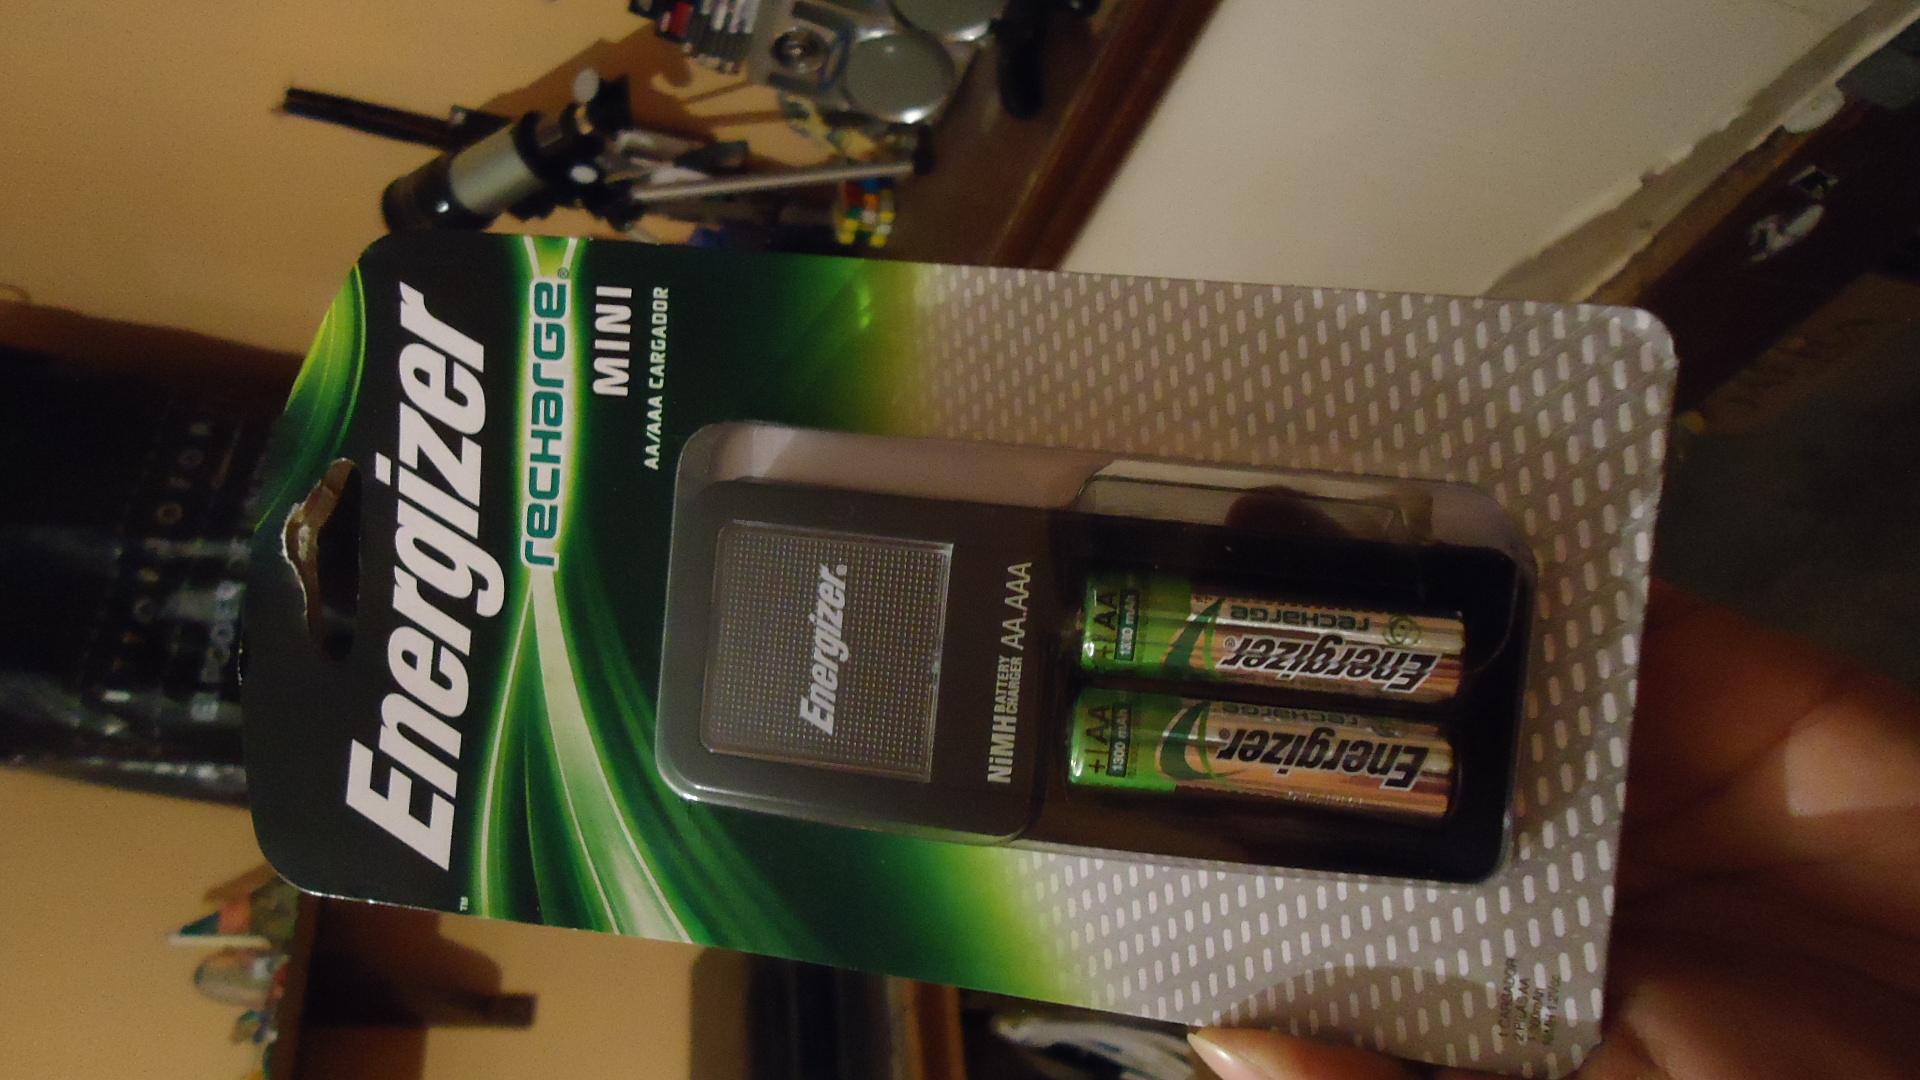 Walmart Estadio Morelia: Baterias Energizer Recargables cargador